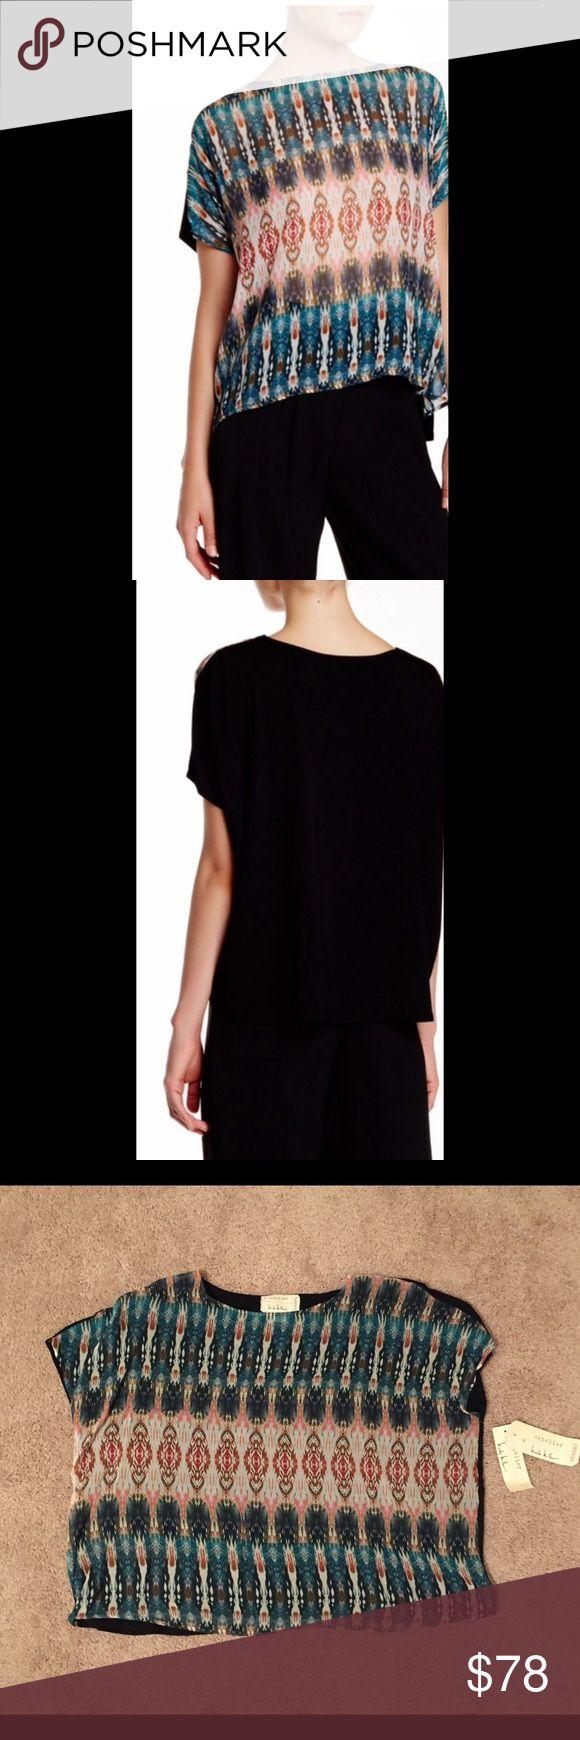 Nicole Miller Printed Blouse Scoop neck, short dolman sleeves, printed front with solid contrast back, hi-lo hem. Self: 100% viscose. Combo: 95% viscose, 5% spandex. Dry clean. Nicole Miller Tops